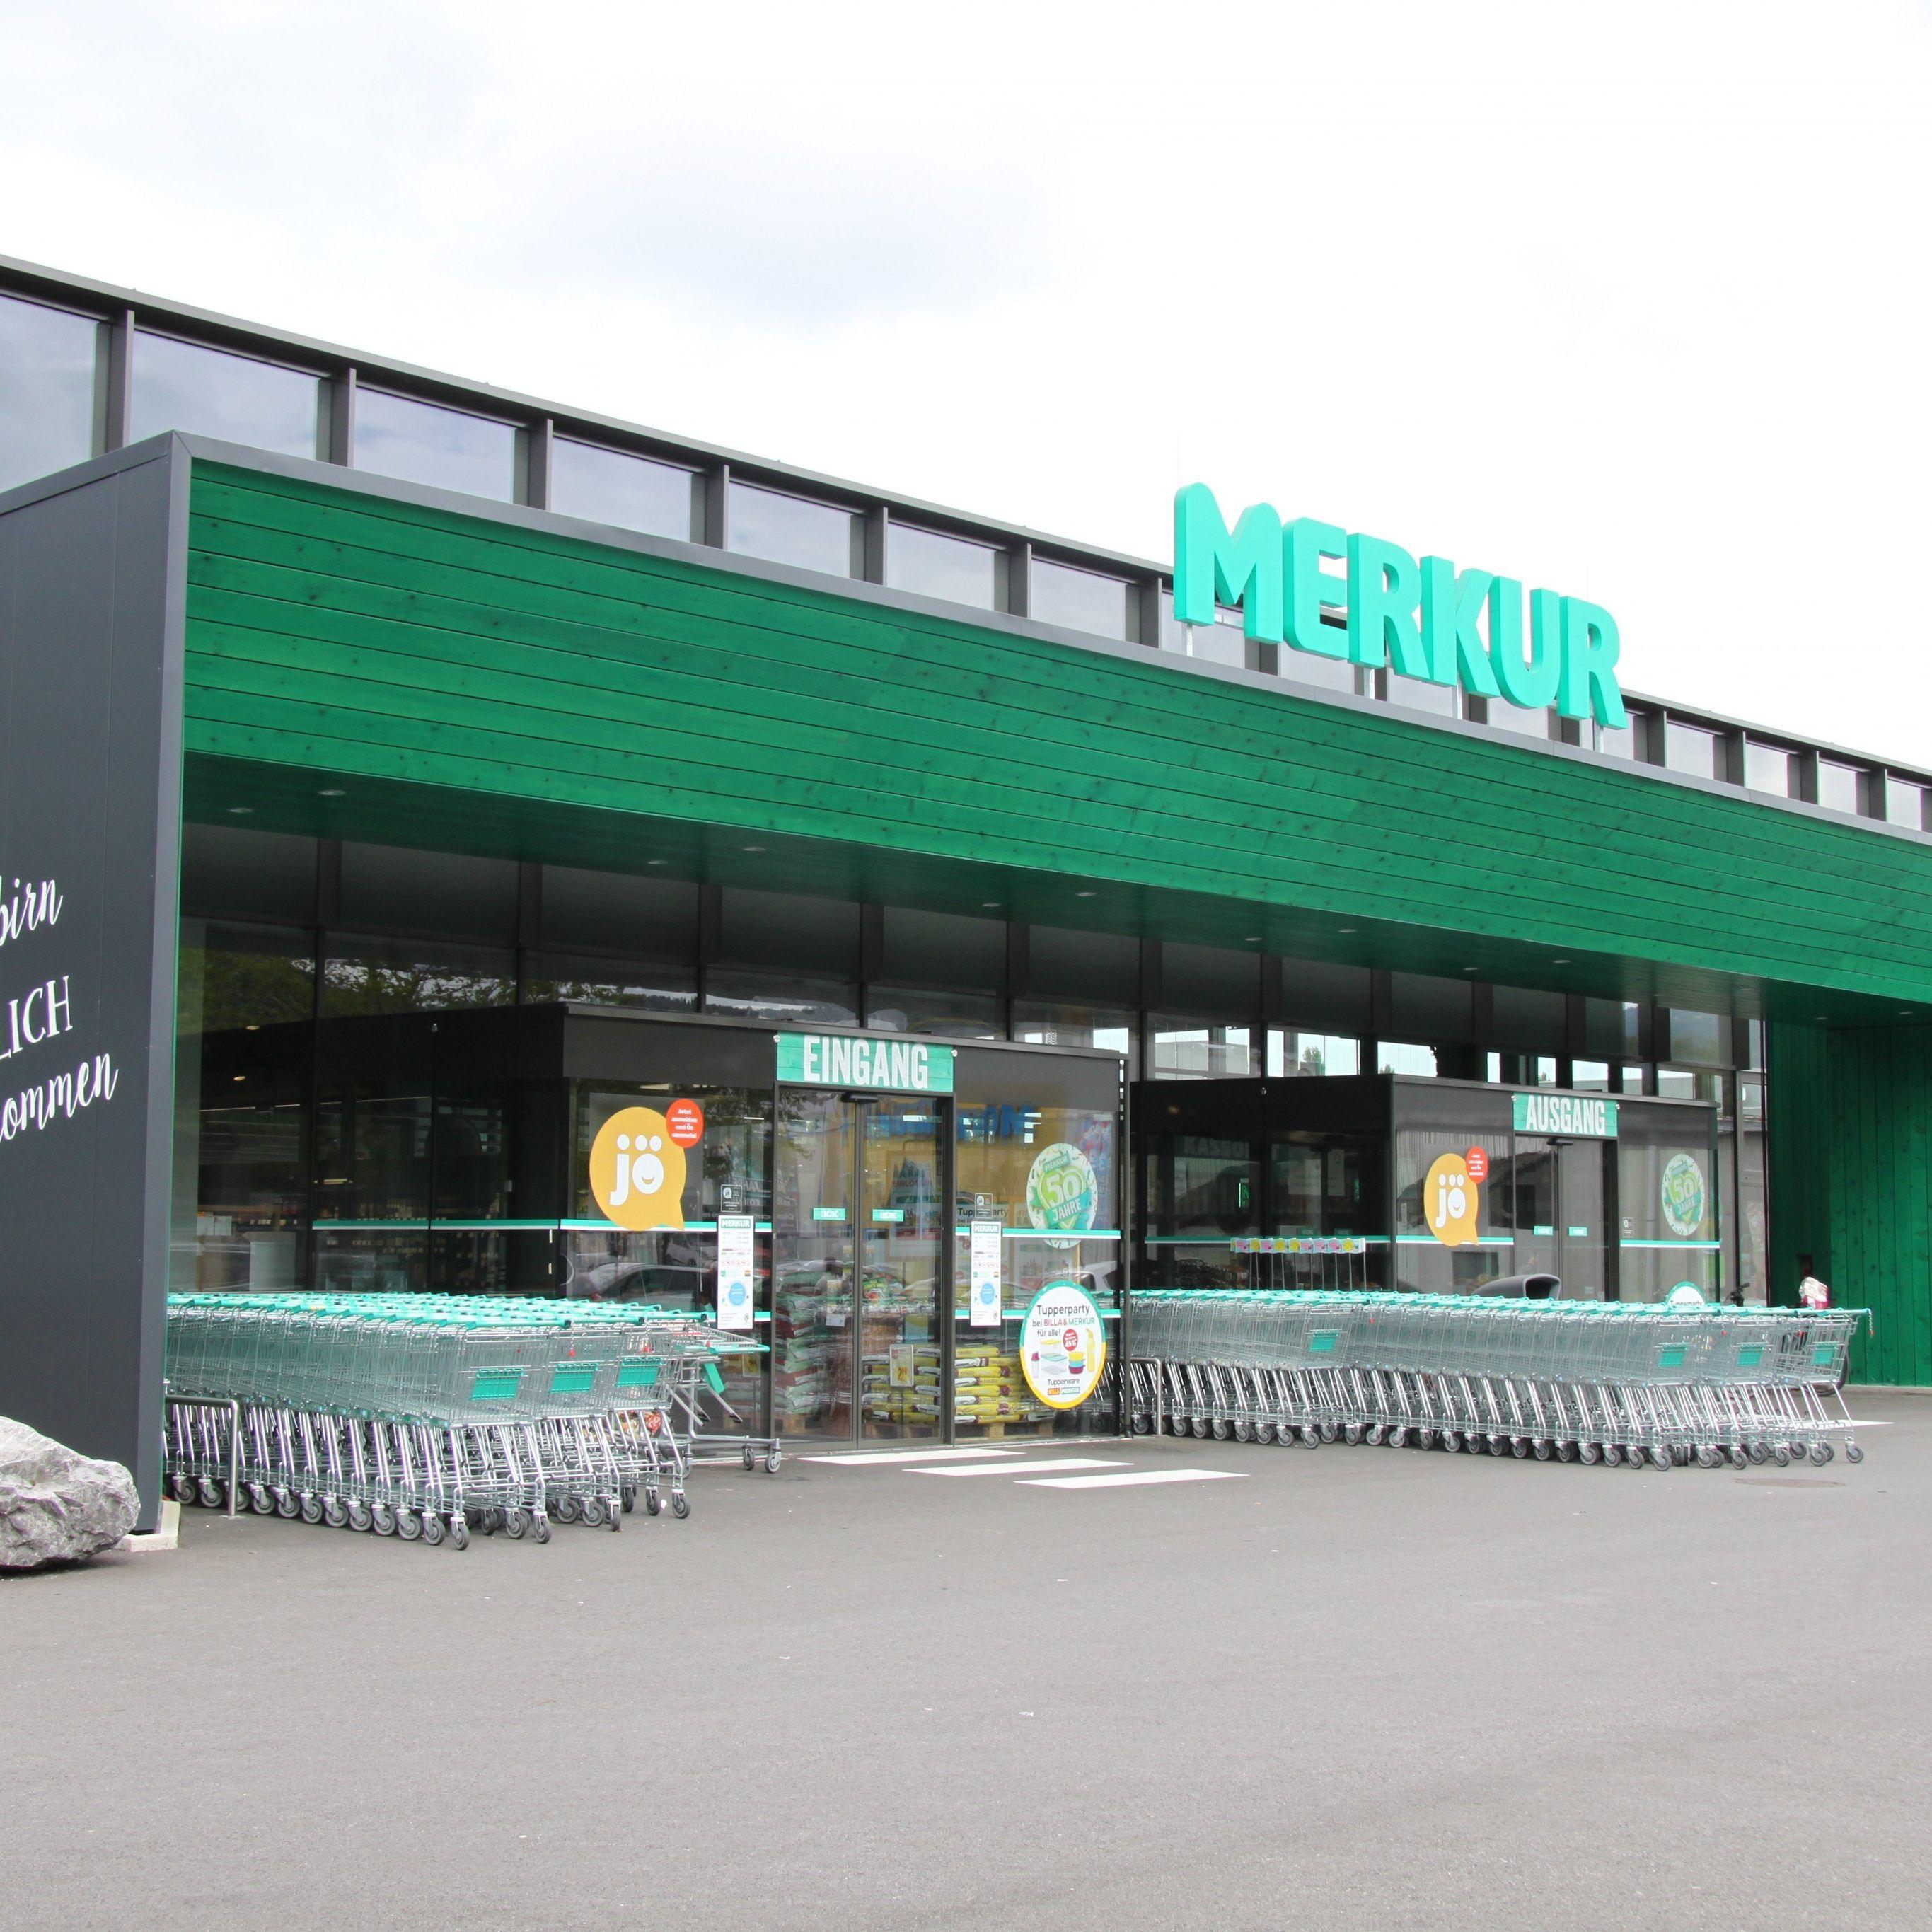 läibt-pep.de: Die neue Dating-Plattform in Vorarlberg - Vorarlberg -- ibt-pep.de